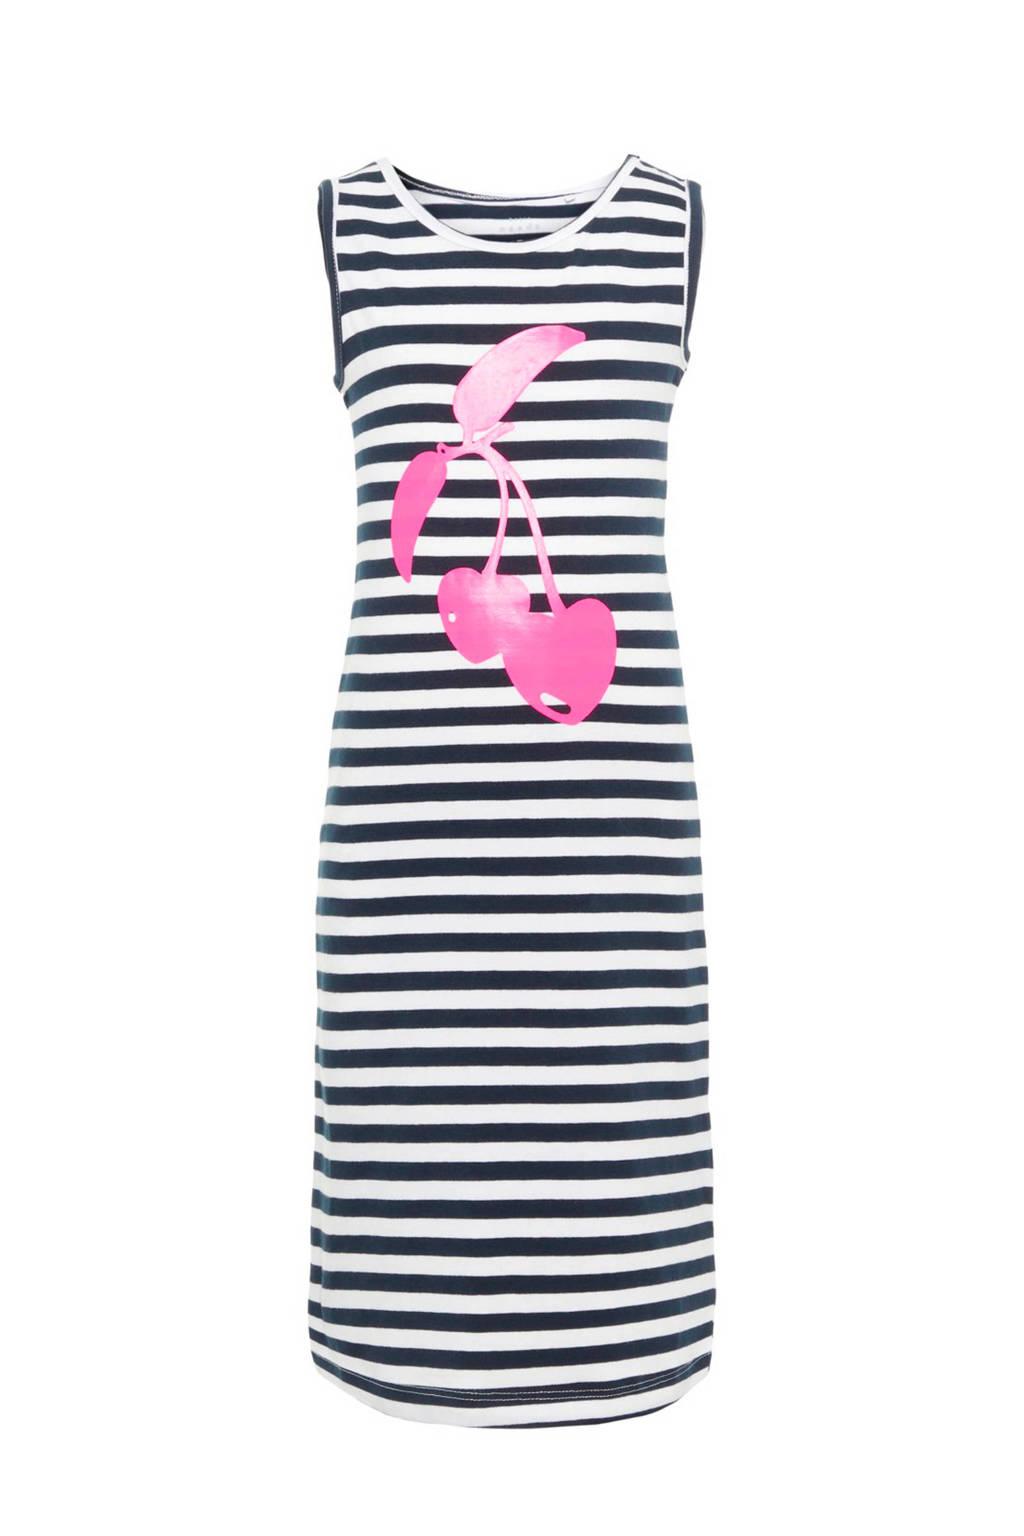 NAME IT gestreepte maxi jurk Vippa met kers blauw, Donkerblauw/wit/roze